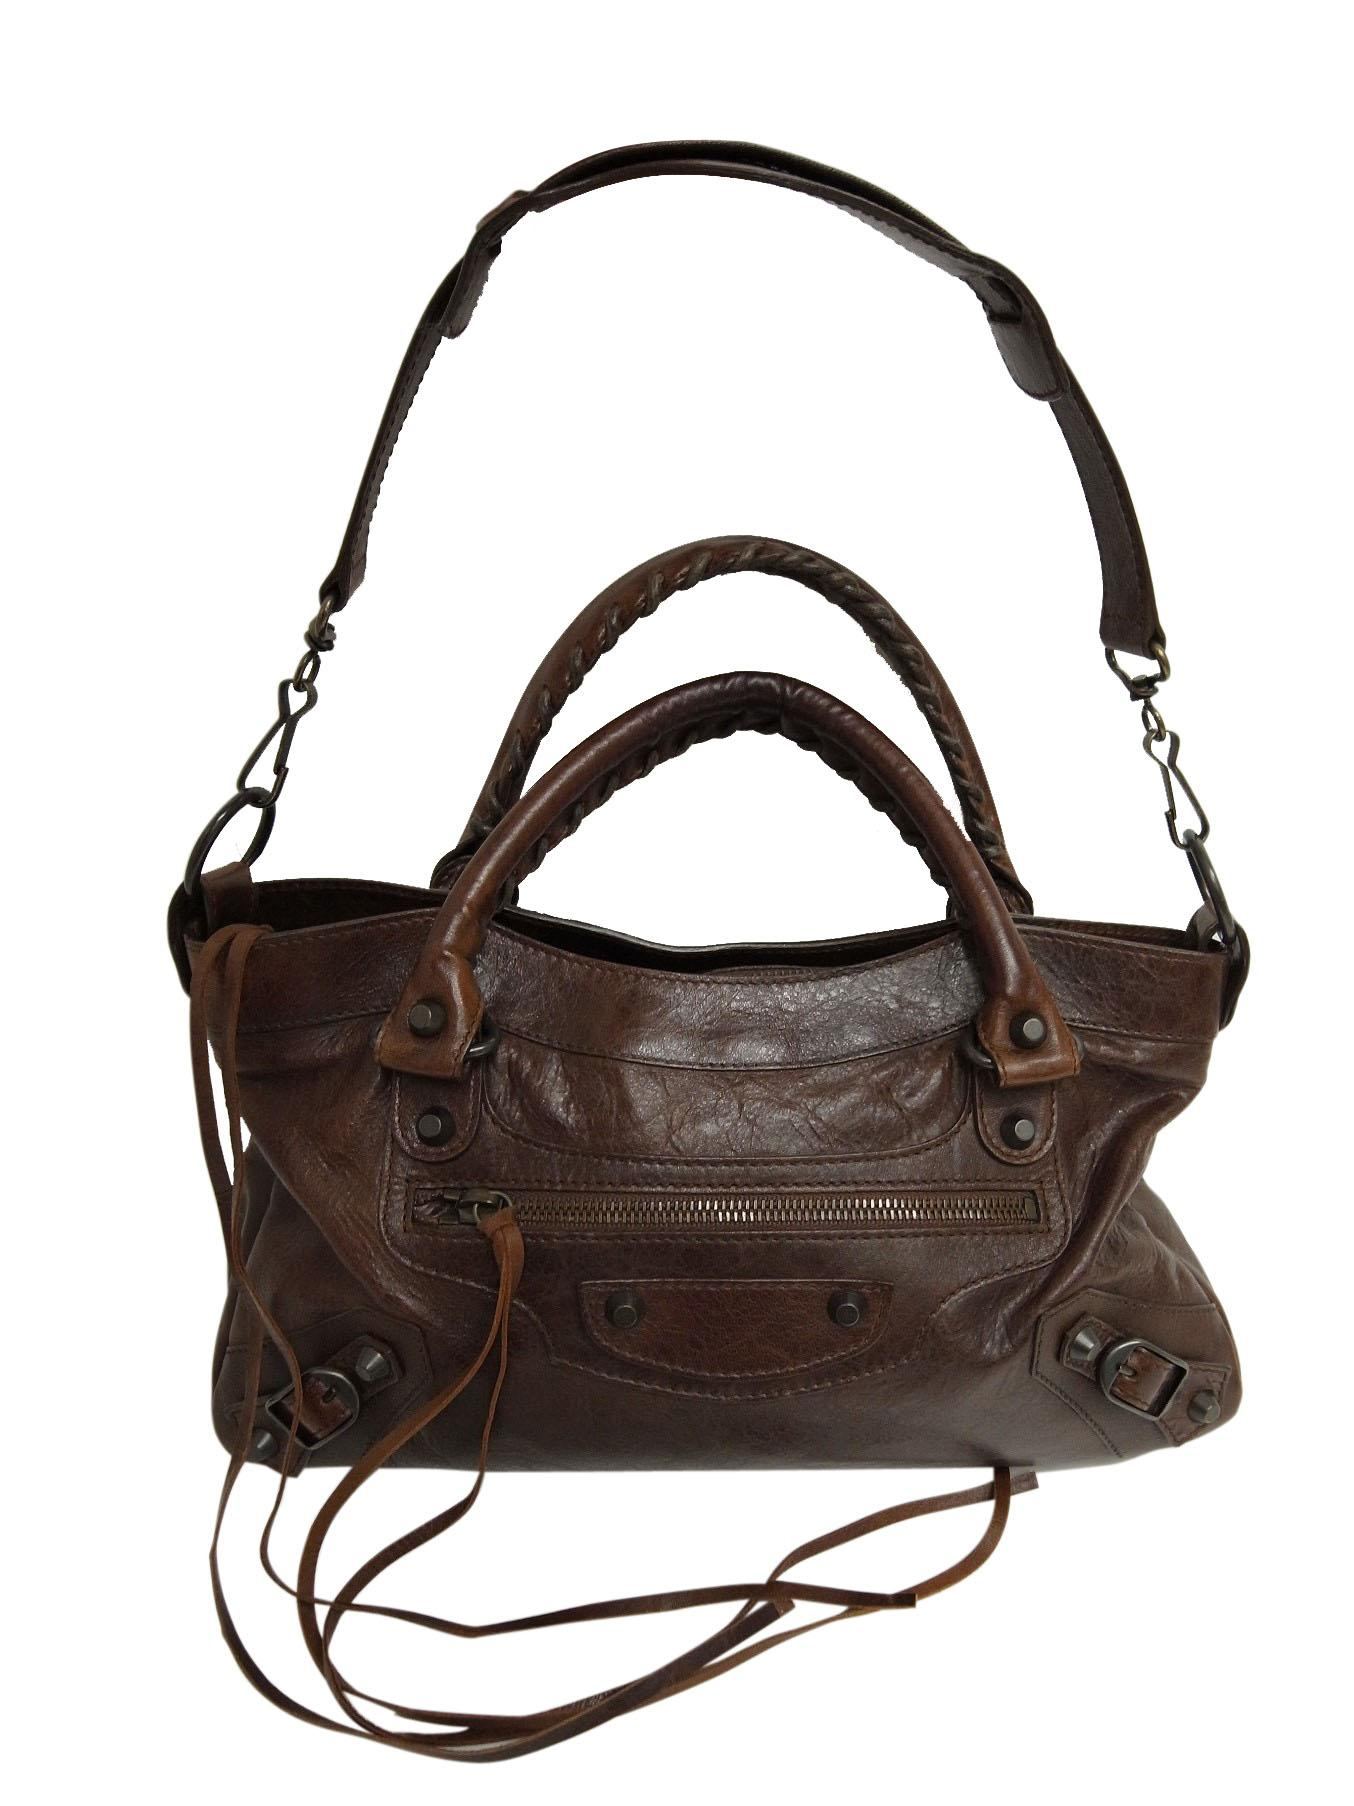 low priced 2ffd8 2c8bf [中古]BALENCIAGA(バレンシアガ)のレディース バッグ エディターズバッグ